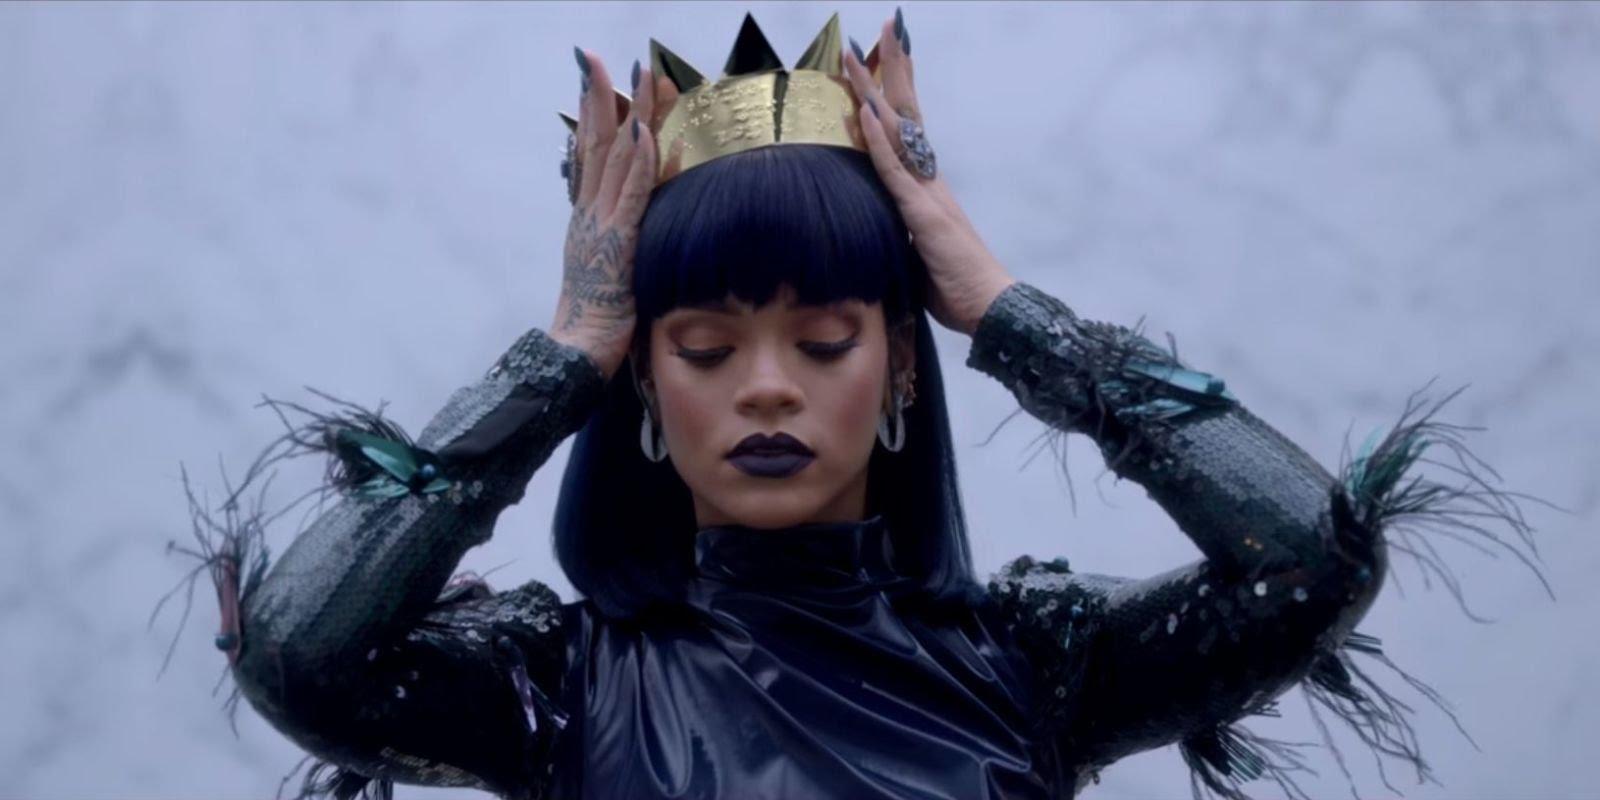 Rihanna speaks of new music with Instagram fan, 2018 documentary brewing